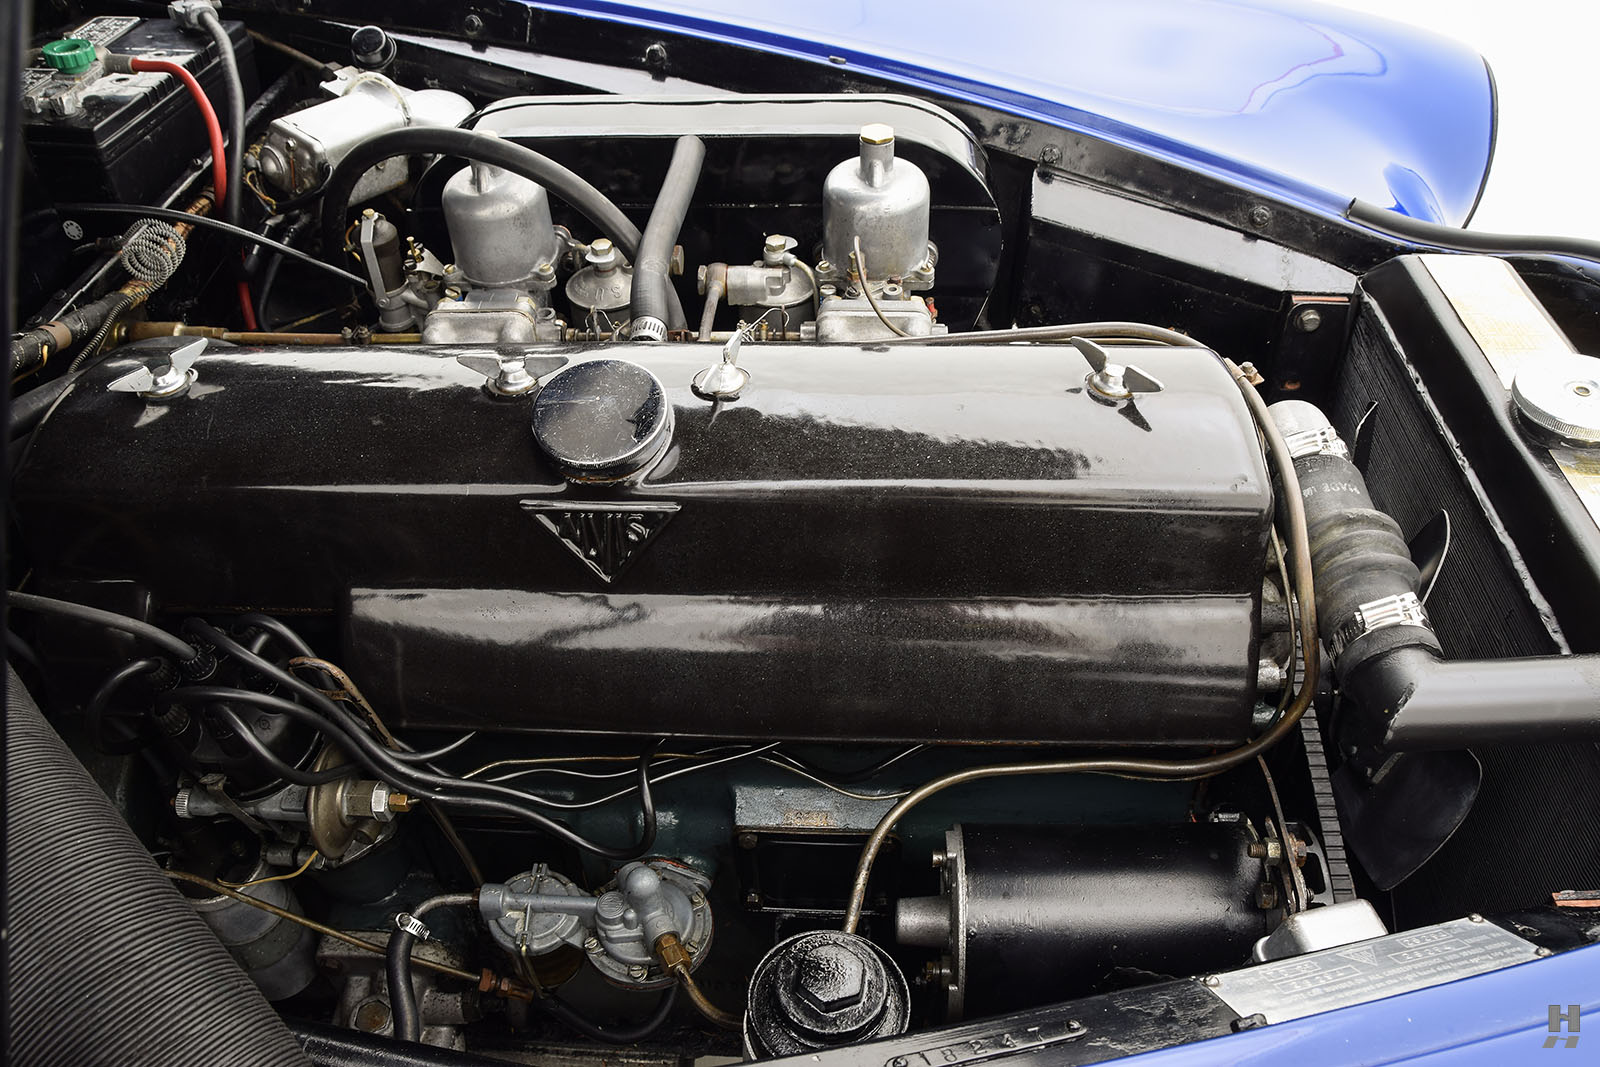 Bentleys For Sale >> 1961 Alvis TD21 Coupe For Sale | Buy Classic Cars | Hyman LTD